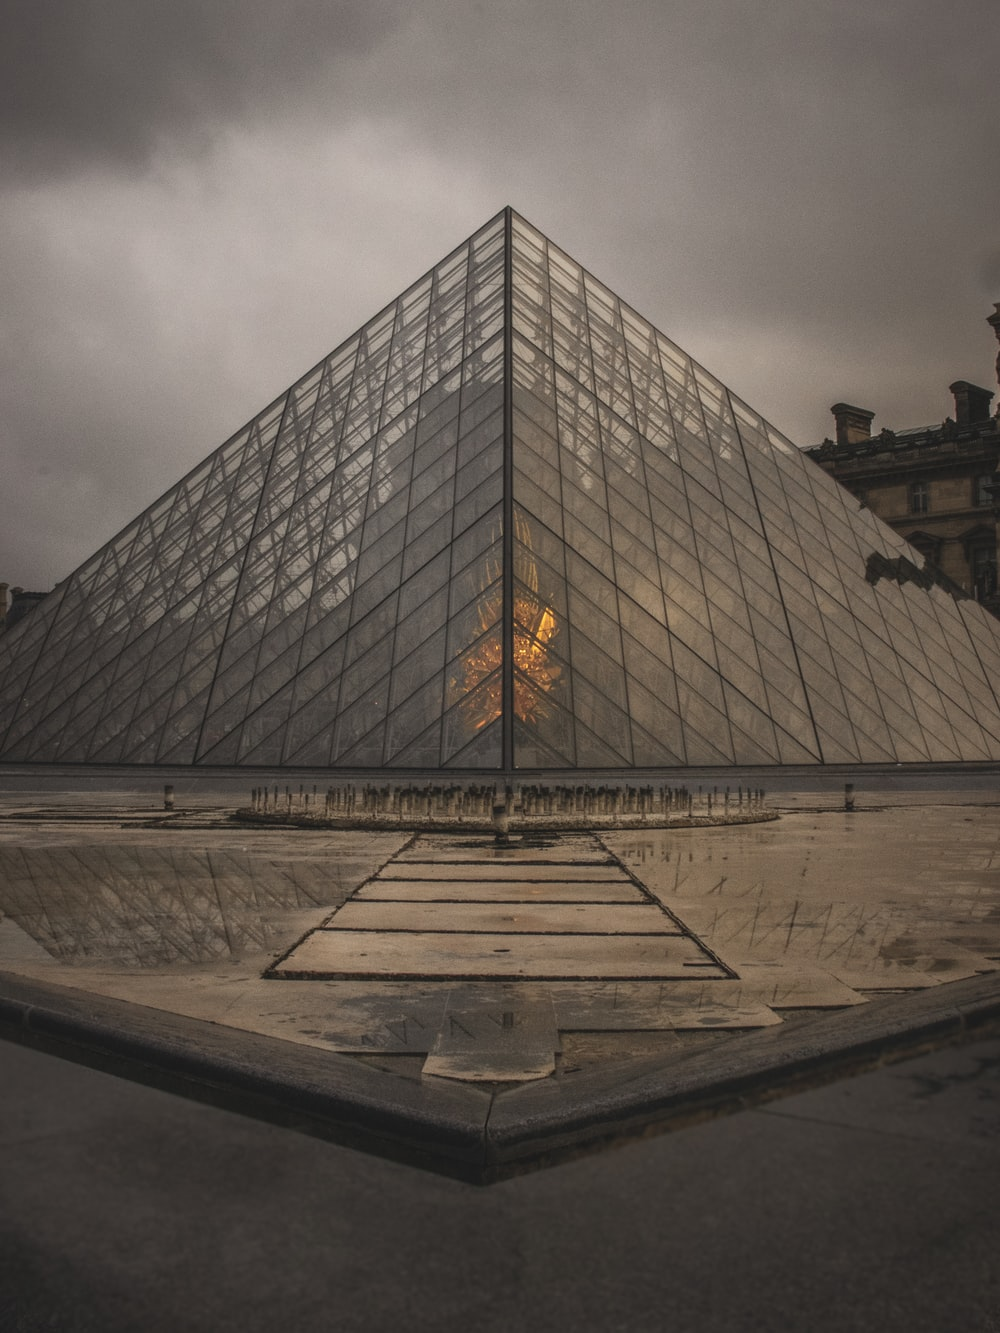 pyramid-shape building